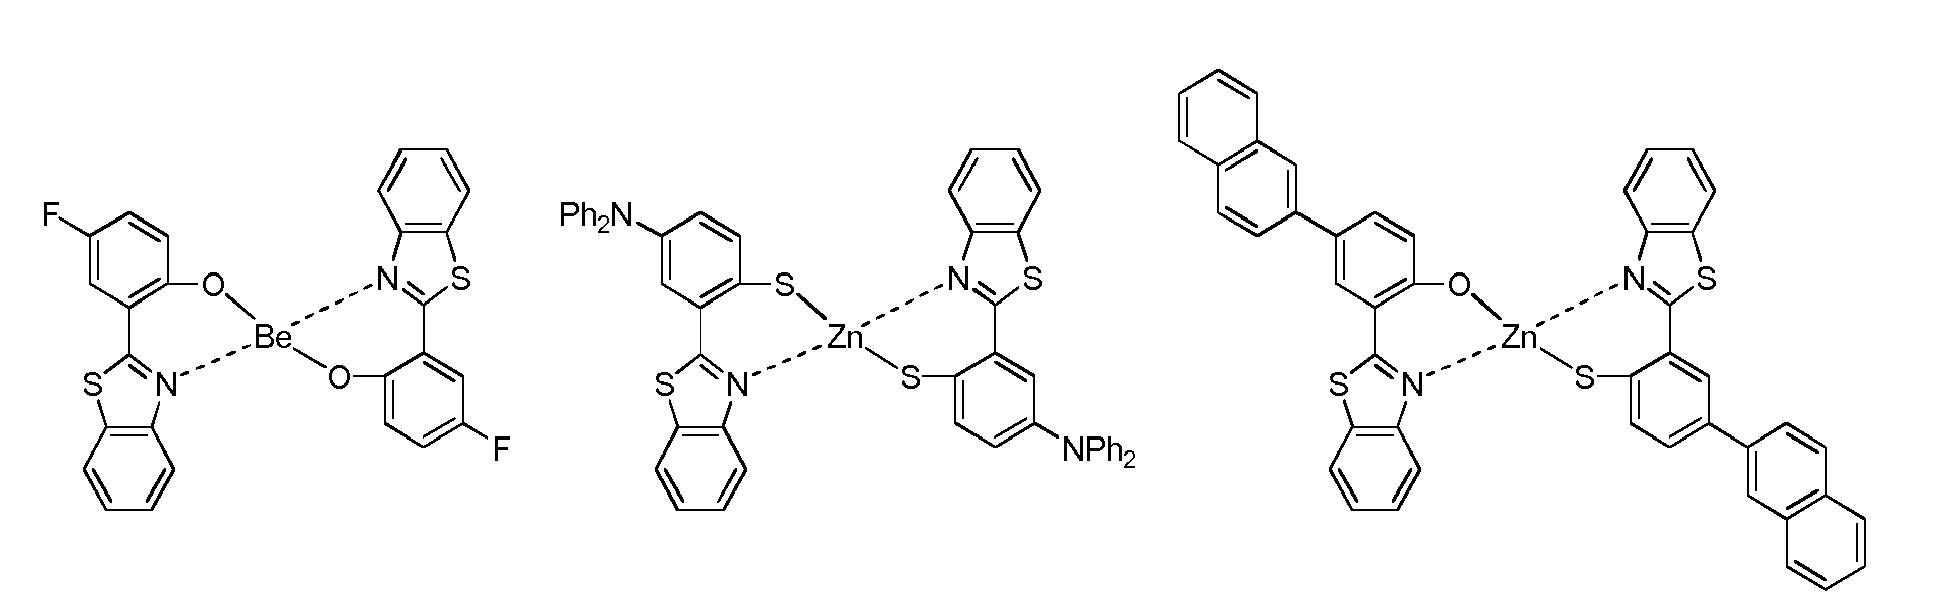 Figure imgb0380